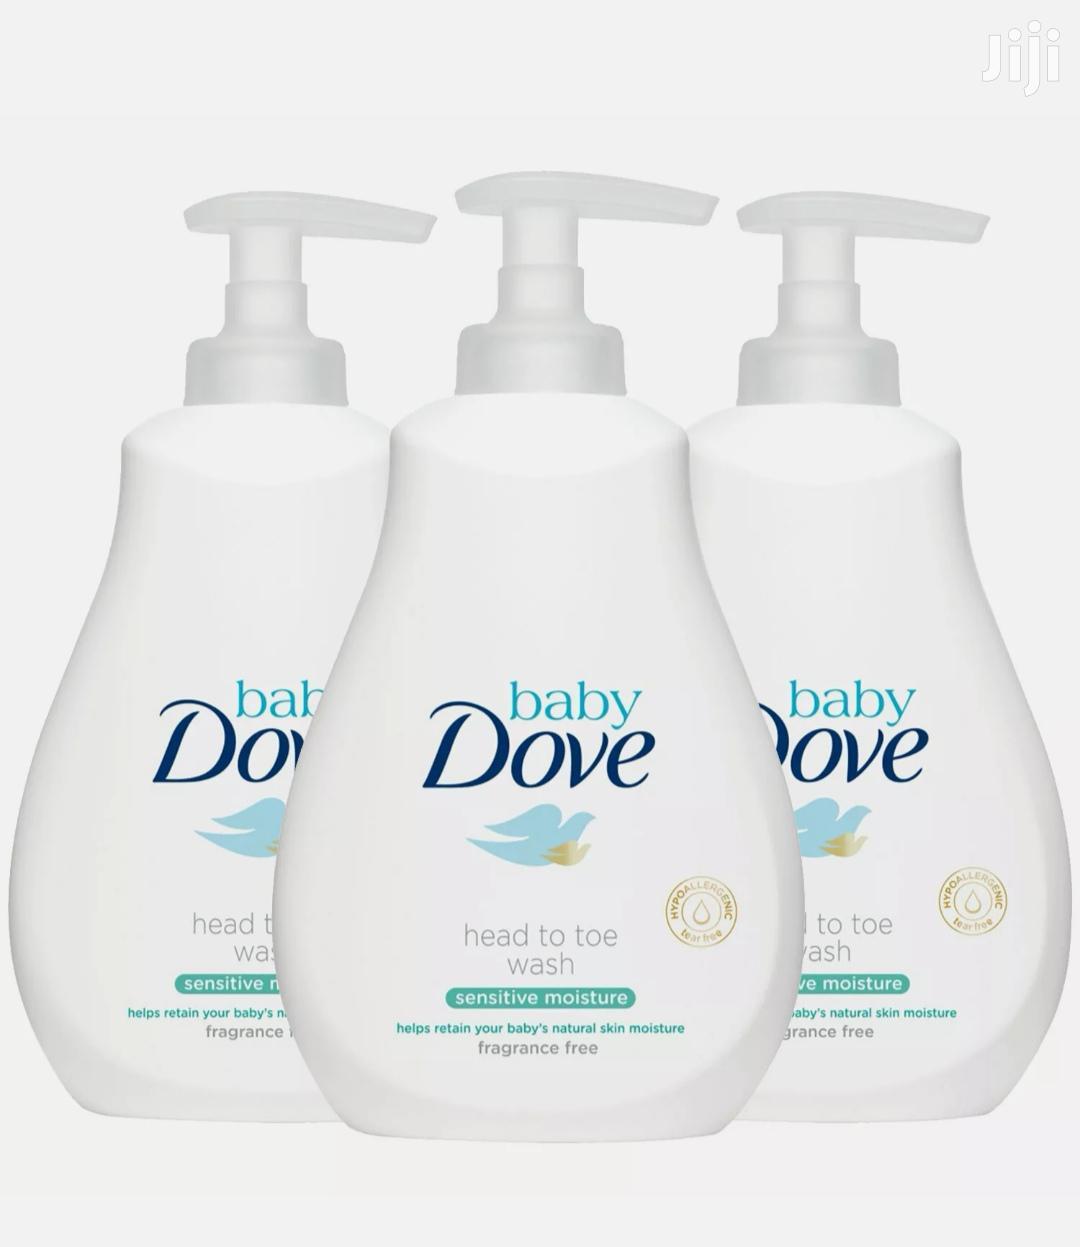 Baby Dove Head to Toe Fragrance Free Sensitive Body Wash